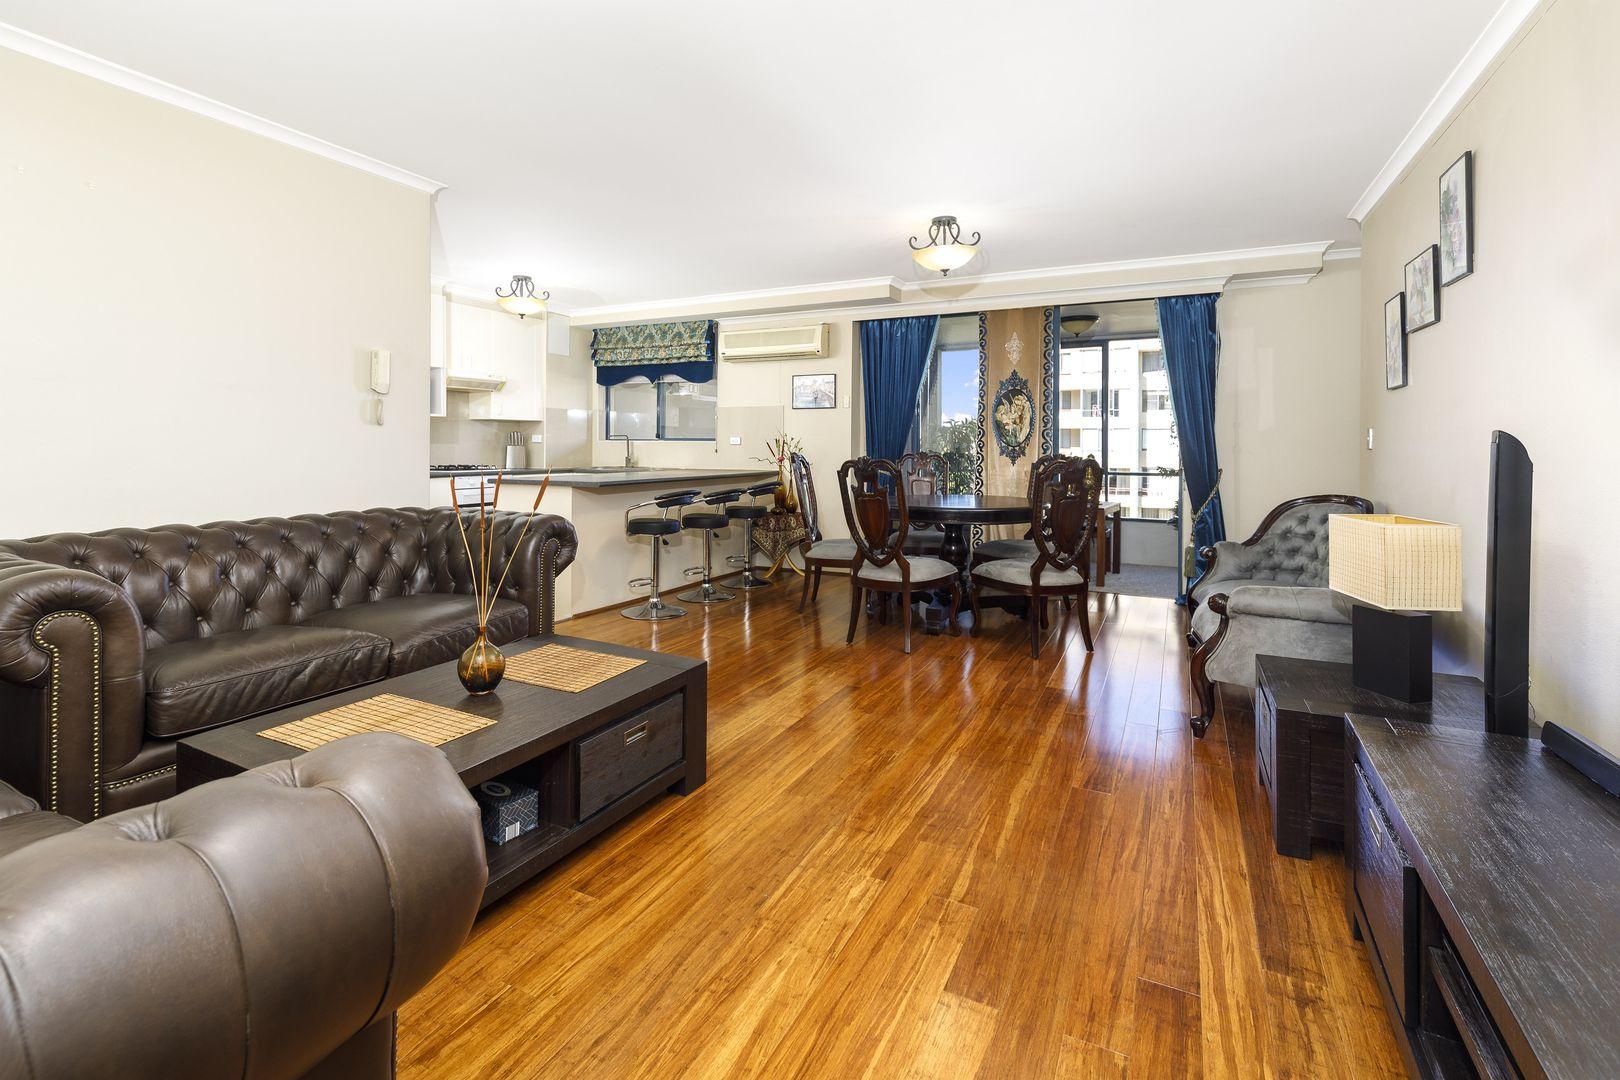 19/1-15 Fontenoy Road, Macquarie Park NSW 2113, Image 0